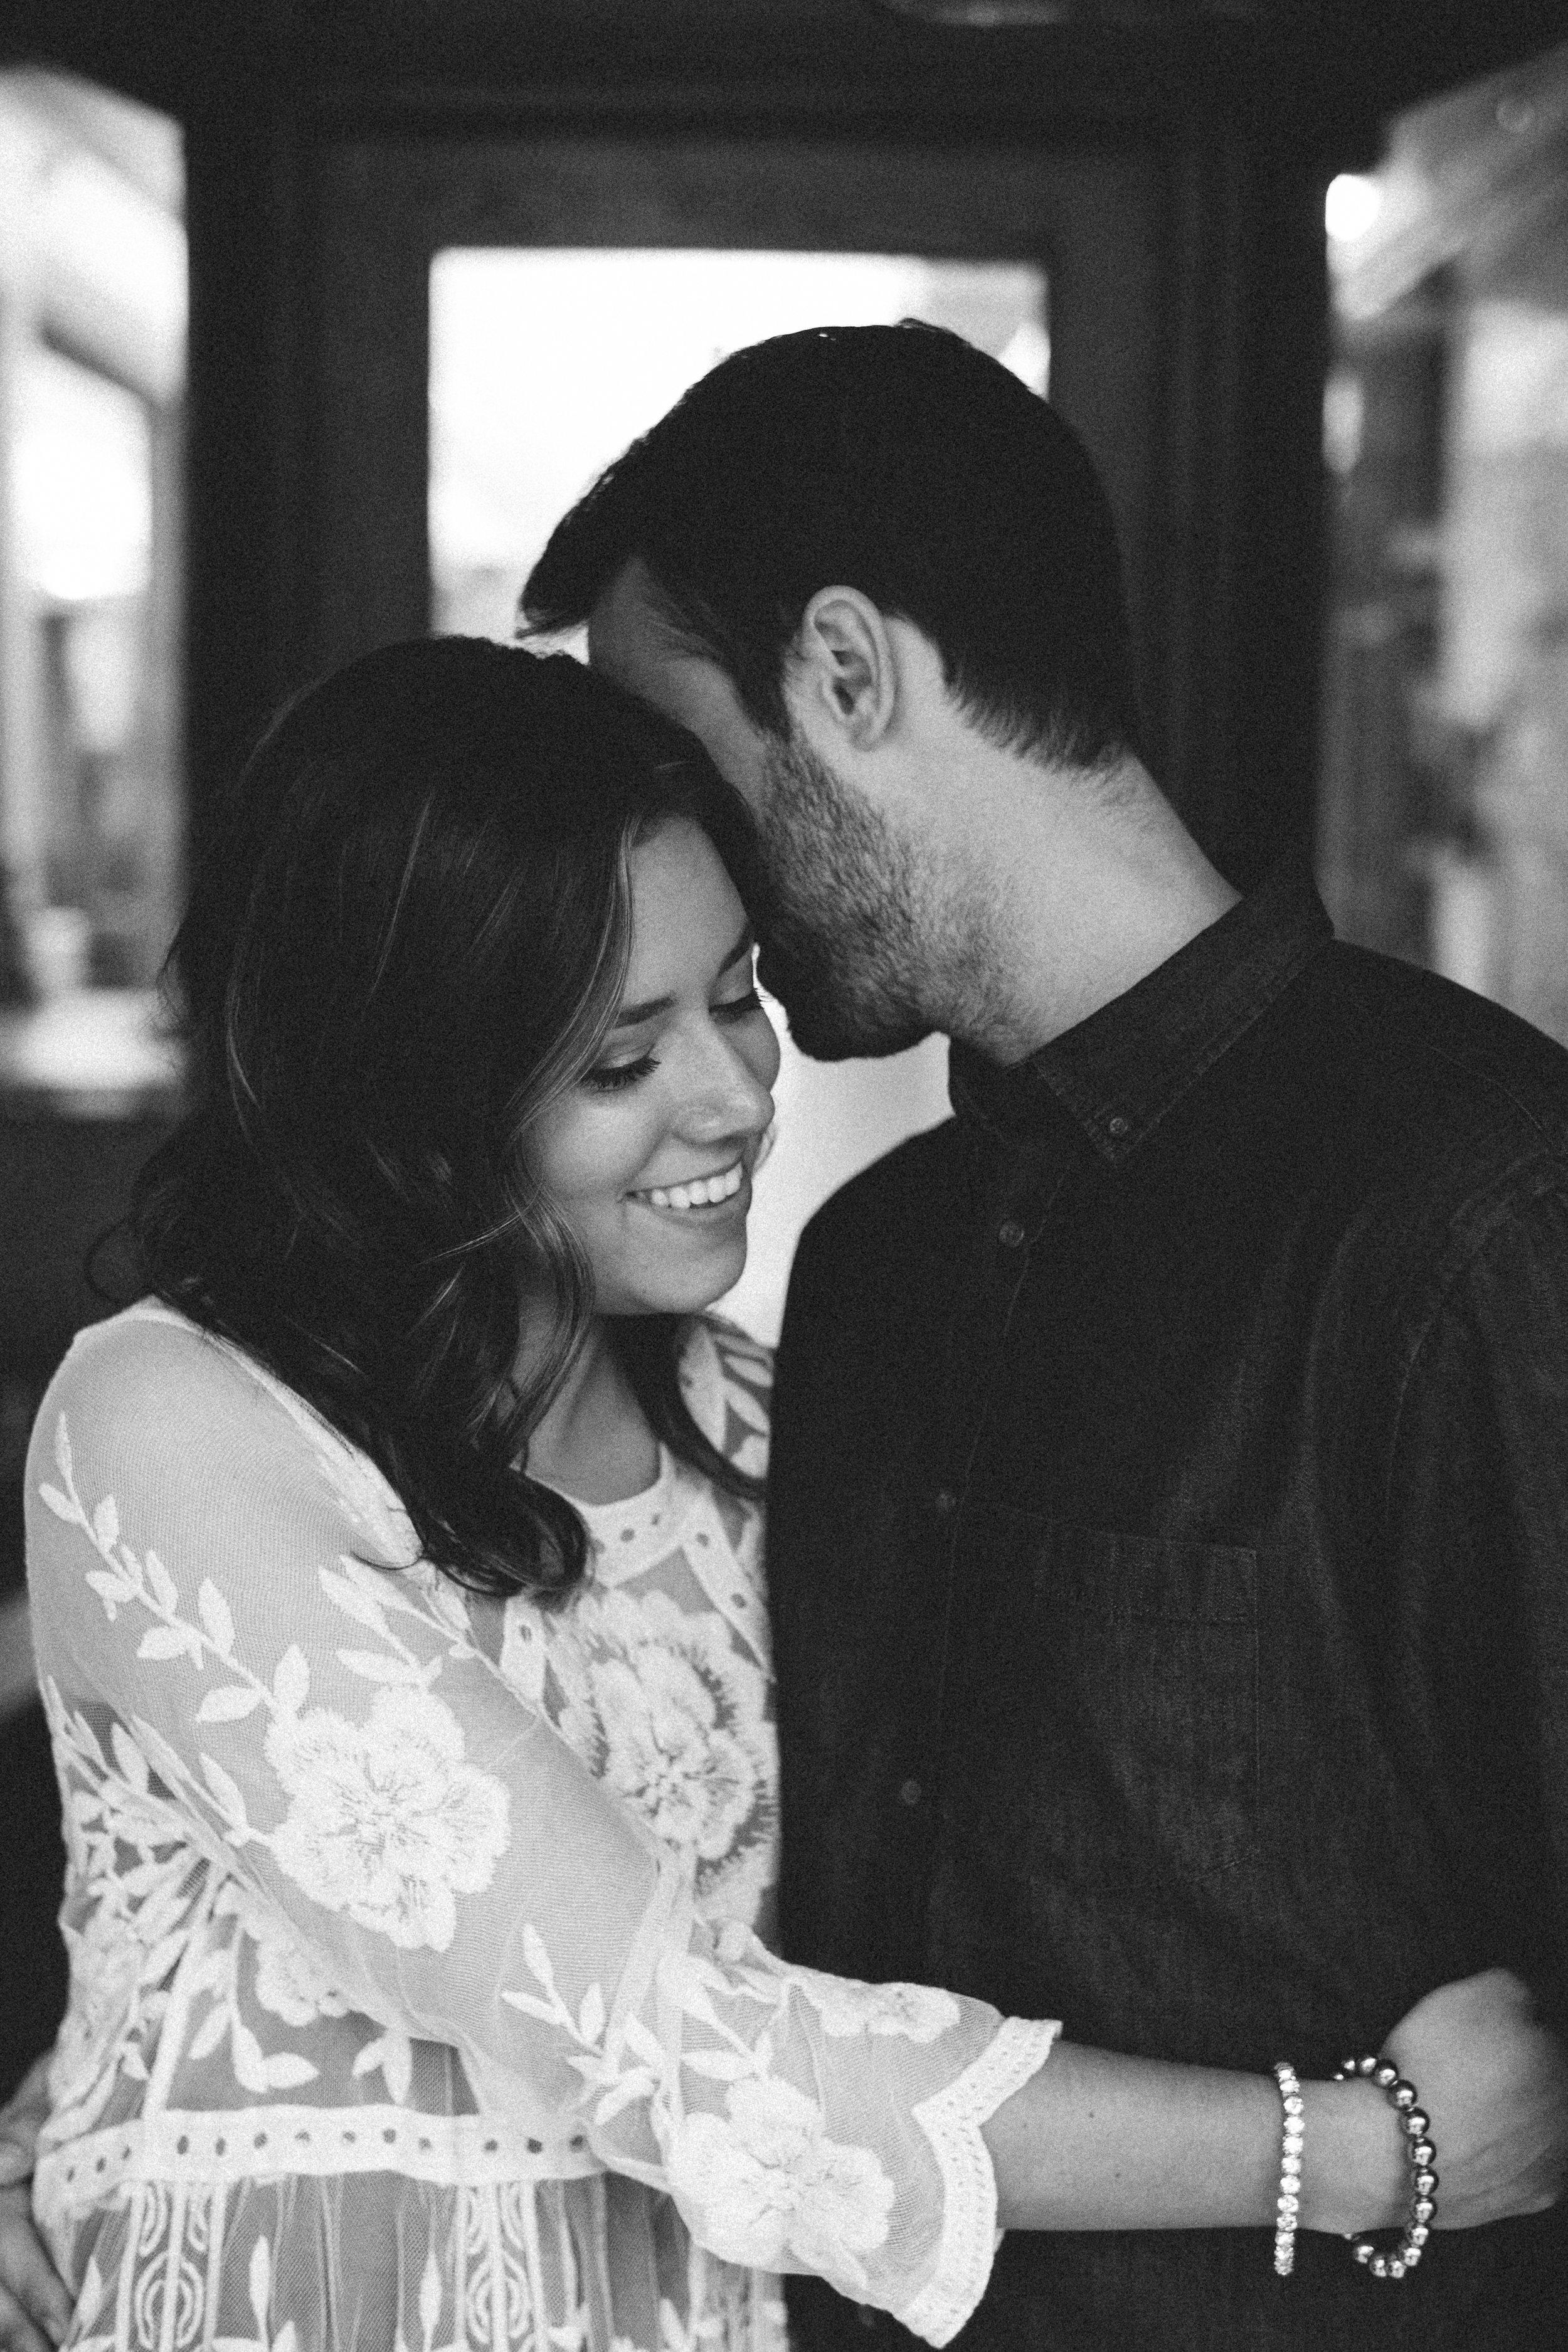 Lauren_Nick_Manzer_Bailey_Engagement_Photos_0182.jpg